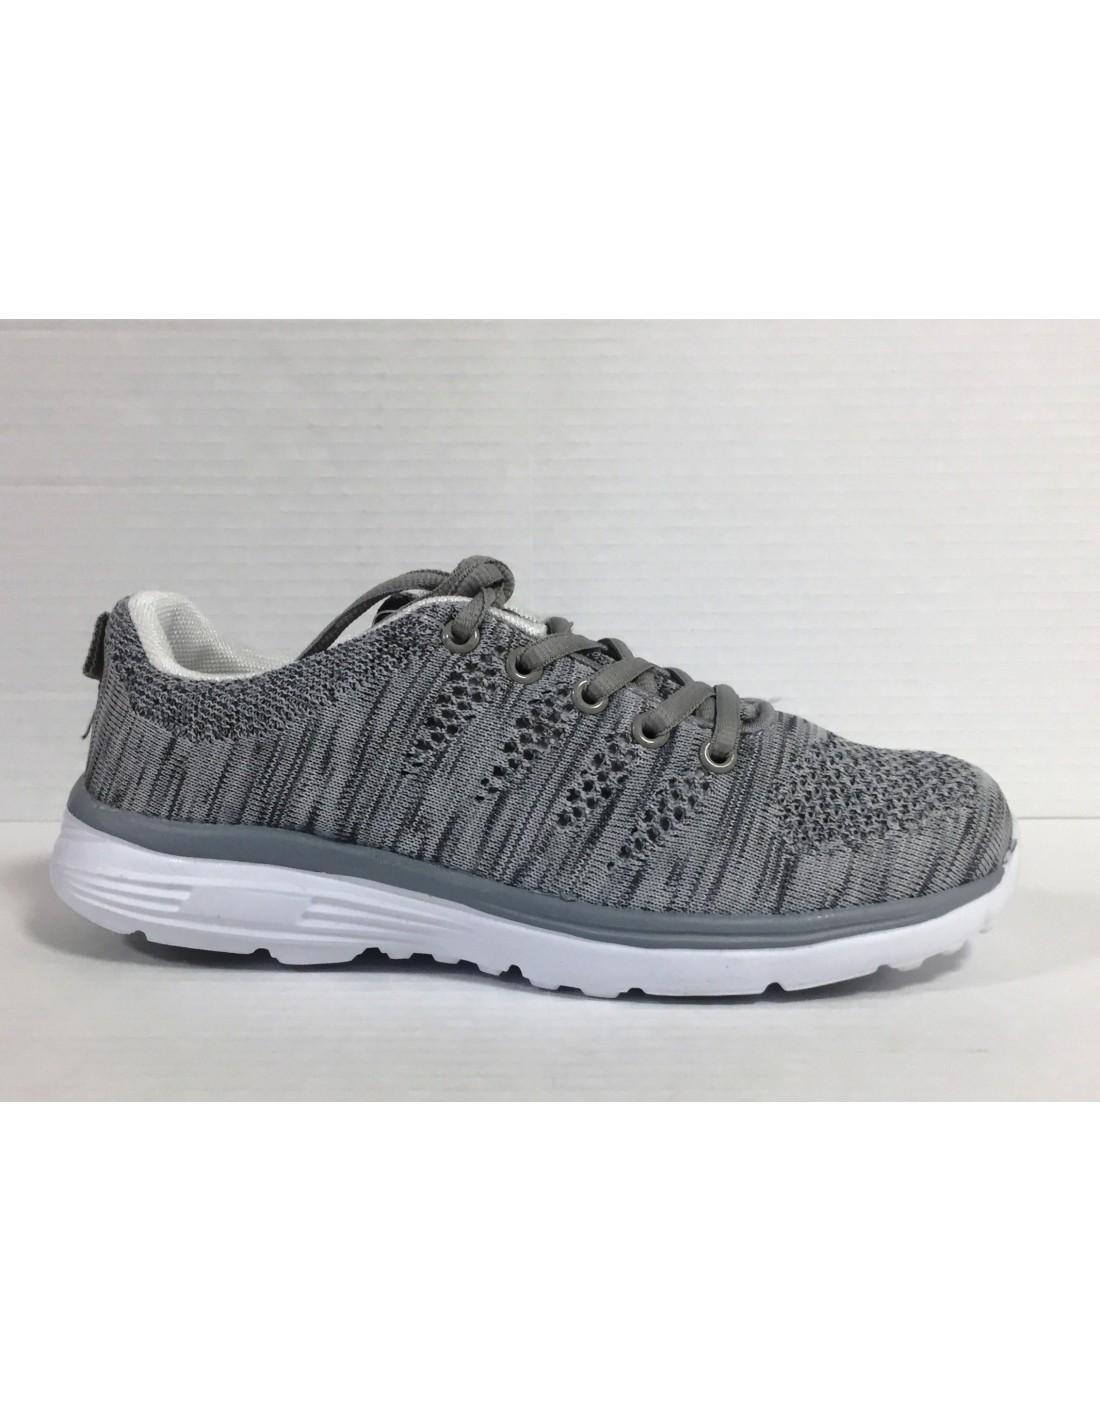 Dimensione danza scarpe donna sneakers sportive soletta interna memoryfoam  Step - Angela Barba